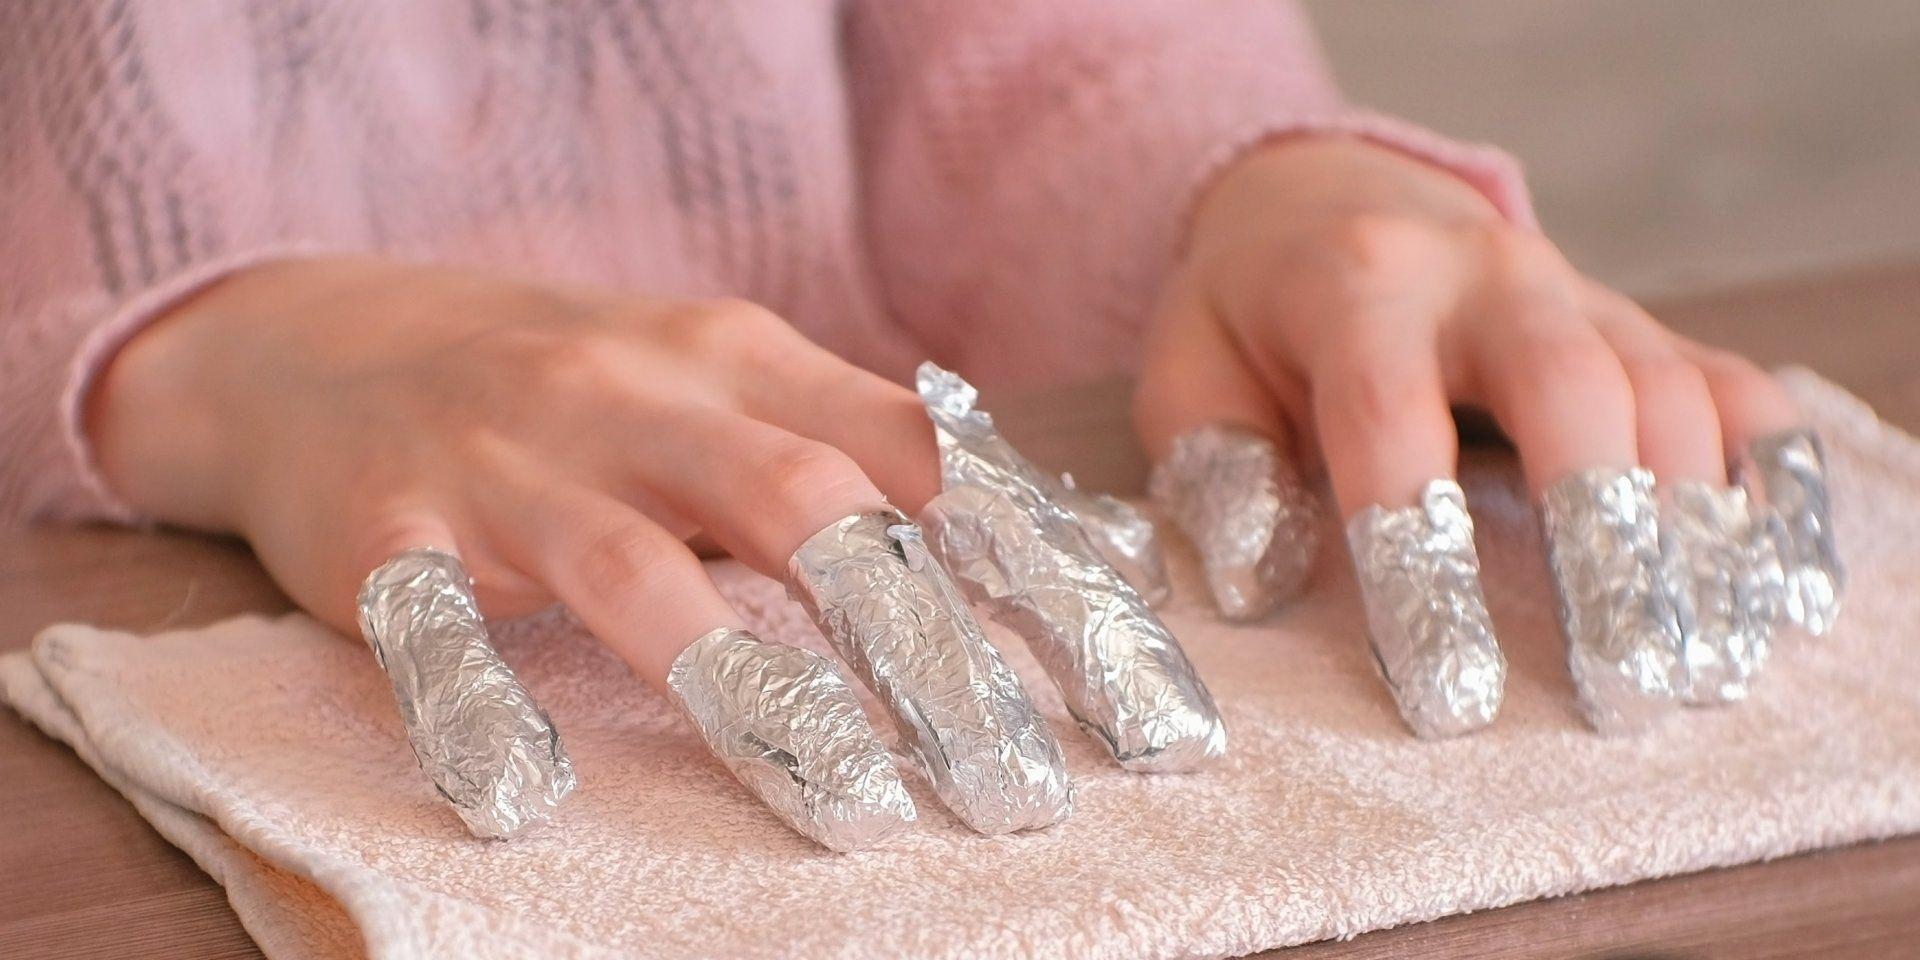 How To Remove Gel Nail Polish At Home Without Ruining Your Nails In 2020 Gel Nail Removal Gel Nail Polish Nail Polish Colors Fall